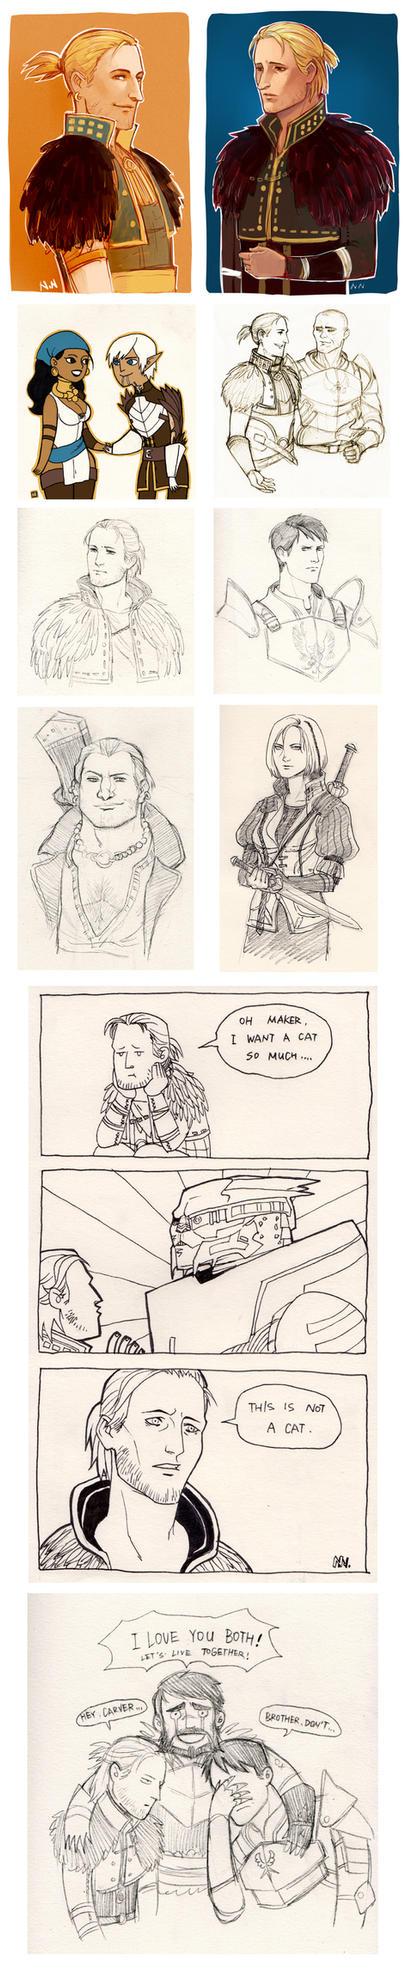 DA2 Doodles by Nicca11y